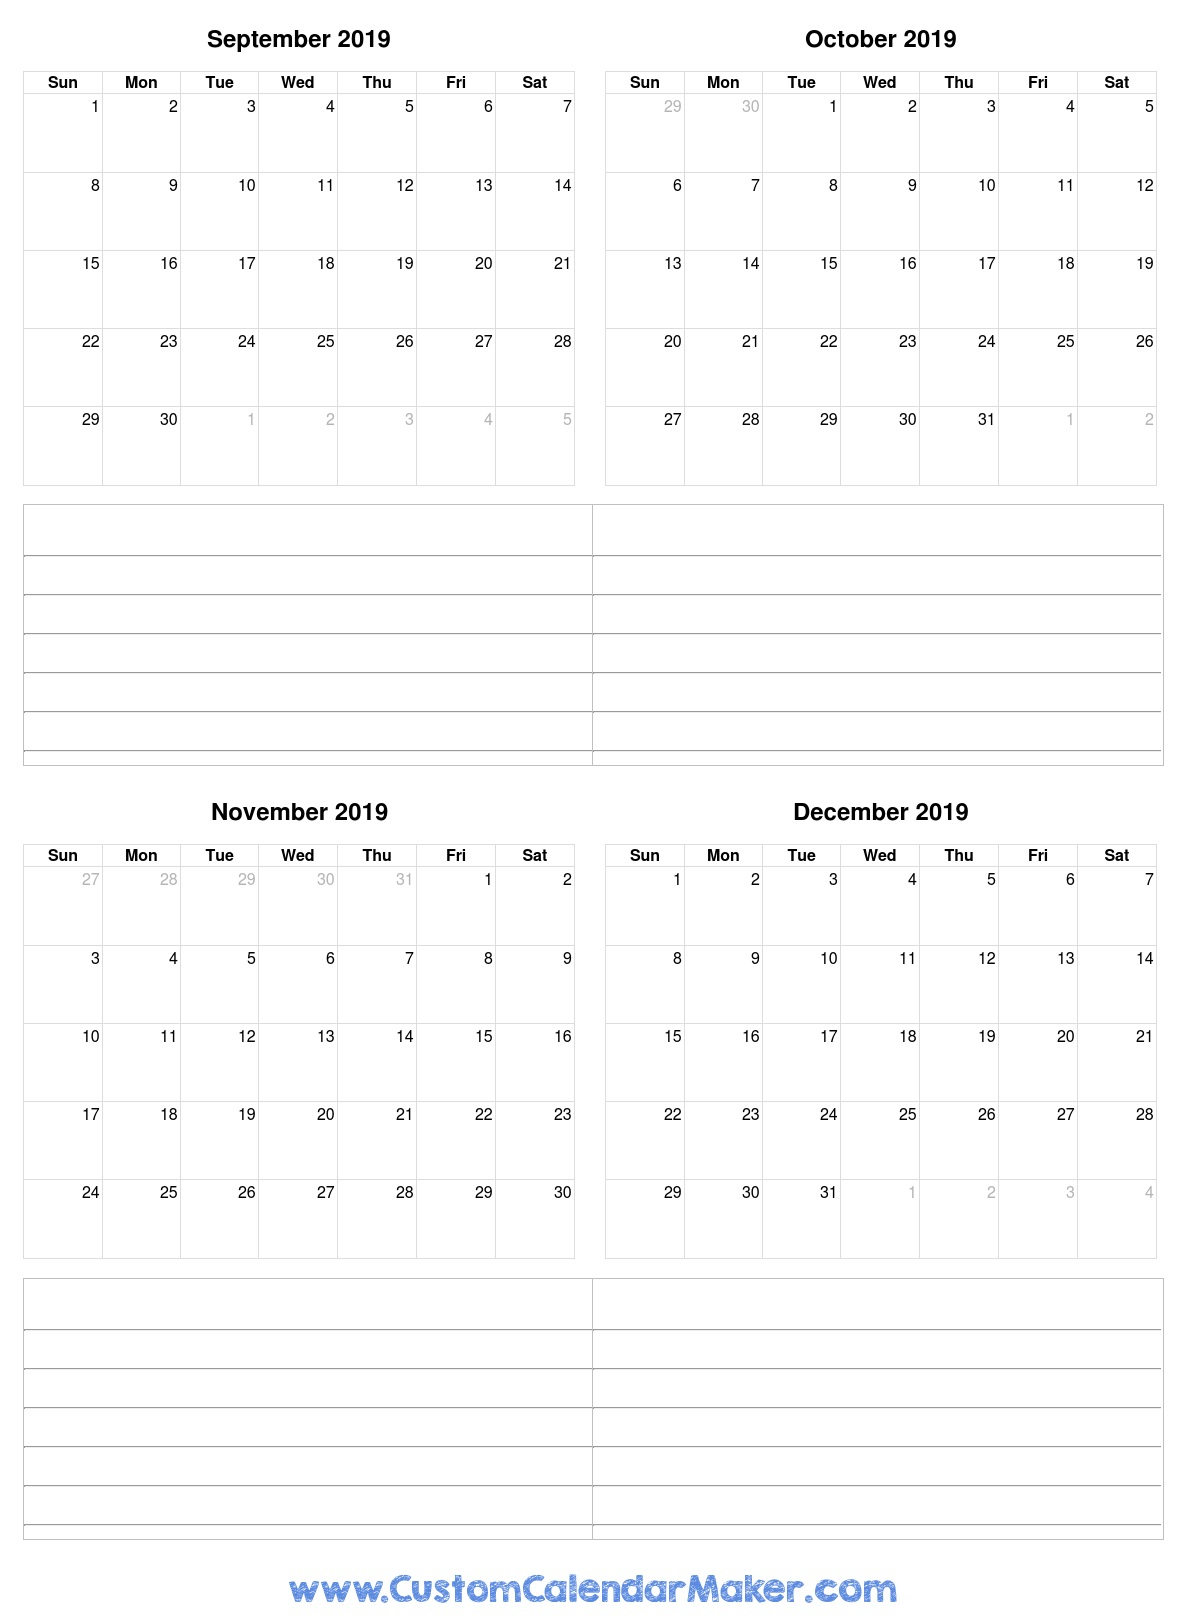 Free Printable Calendars, Blank Pdf Templates To Print A 2019 Calendar regarding Calendar For October Thru December 2019